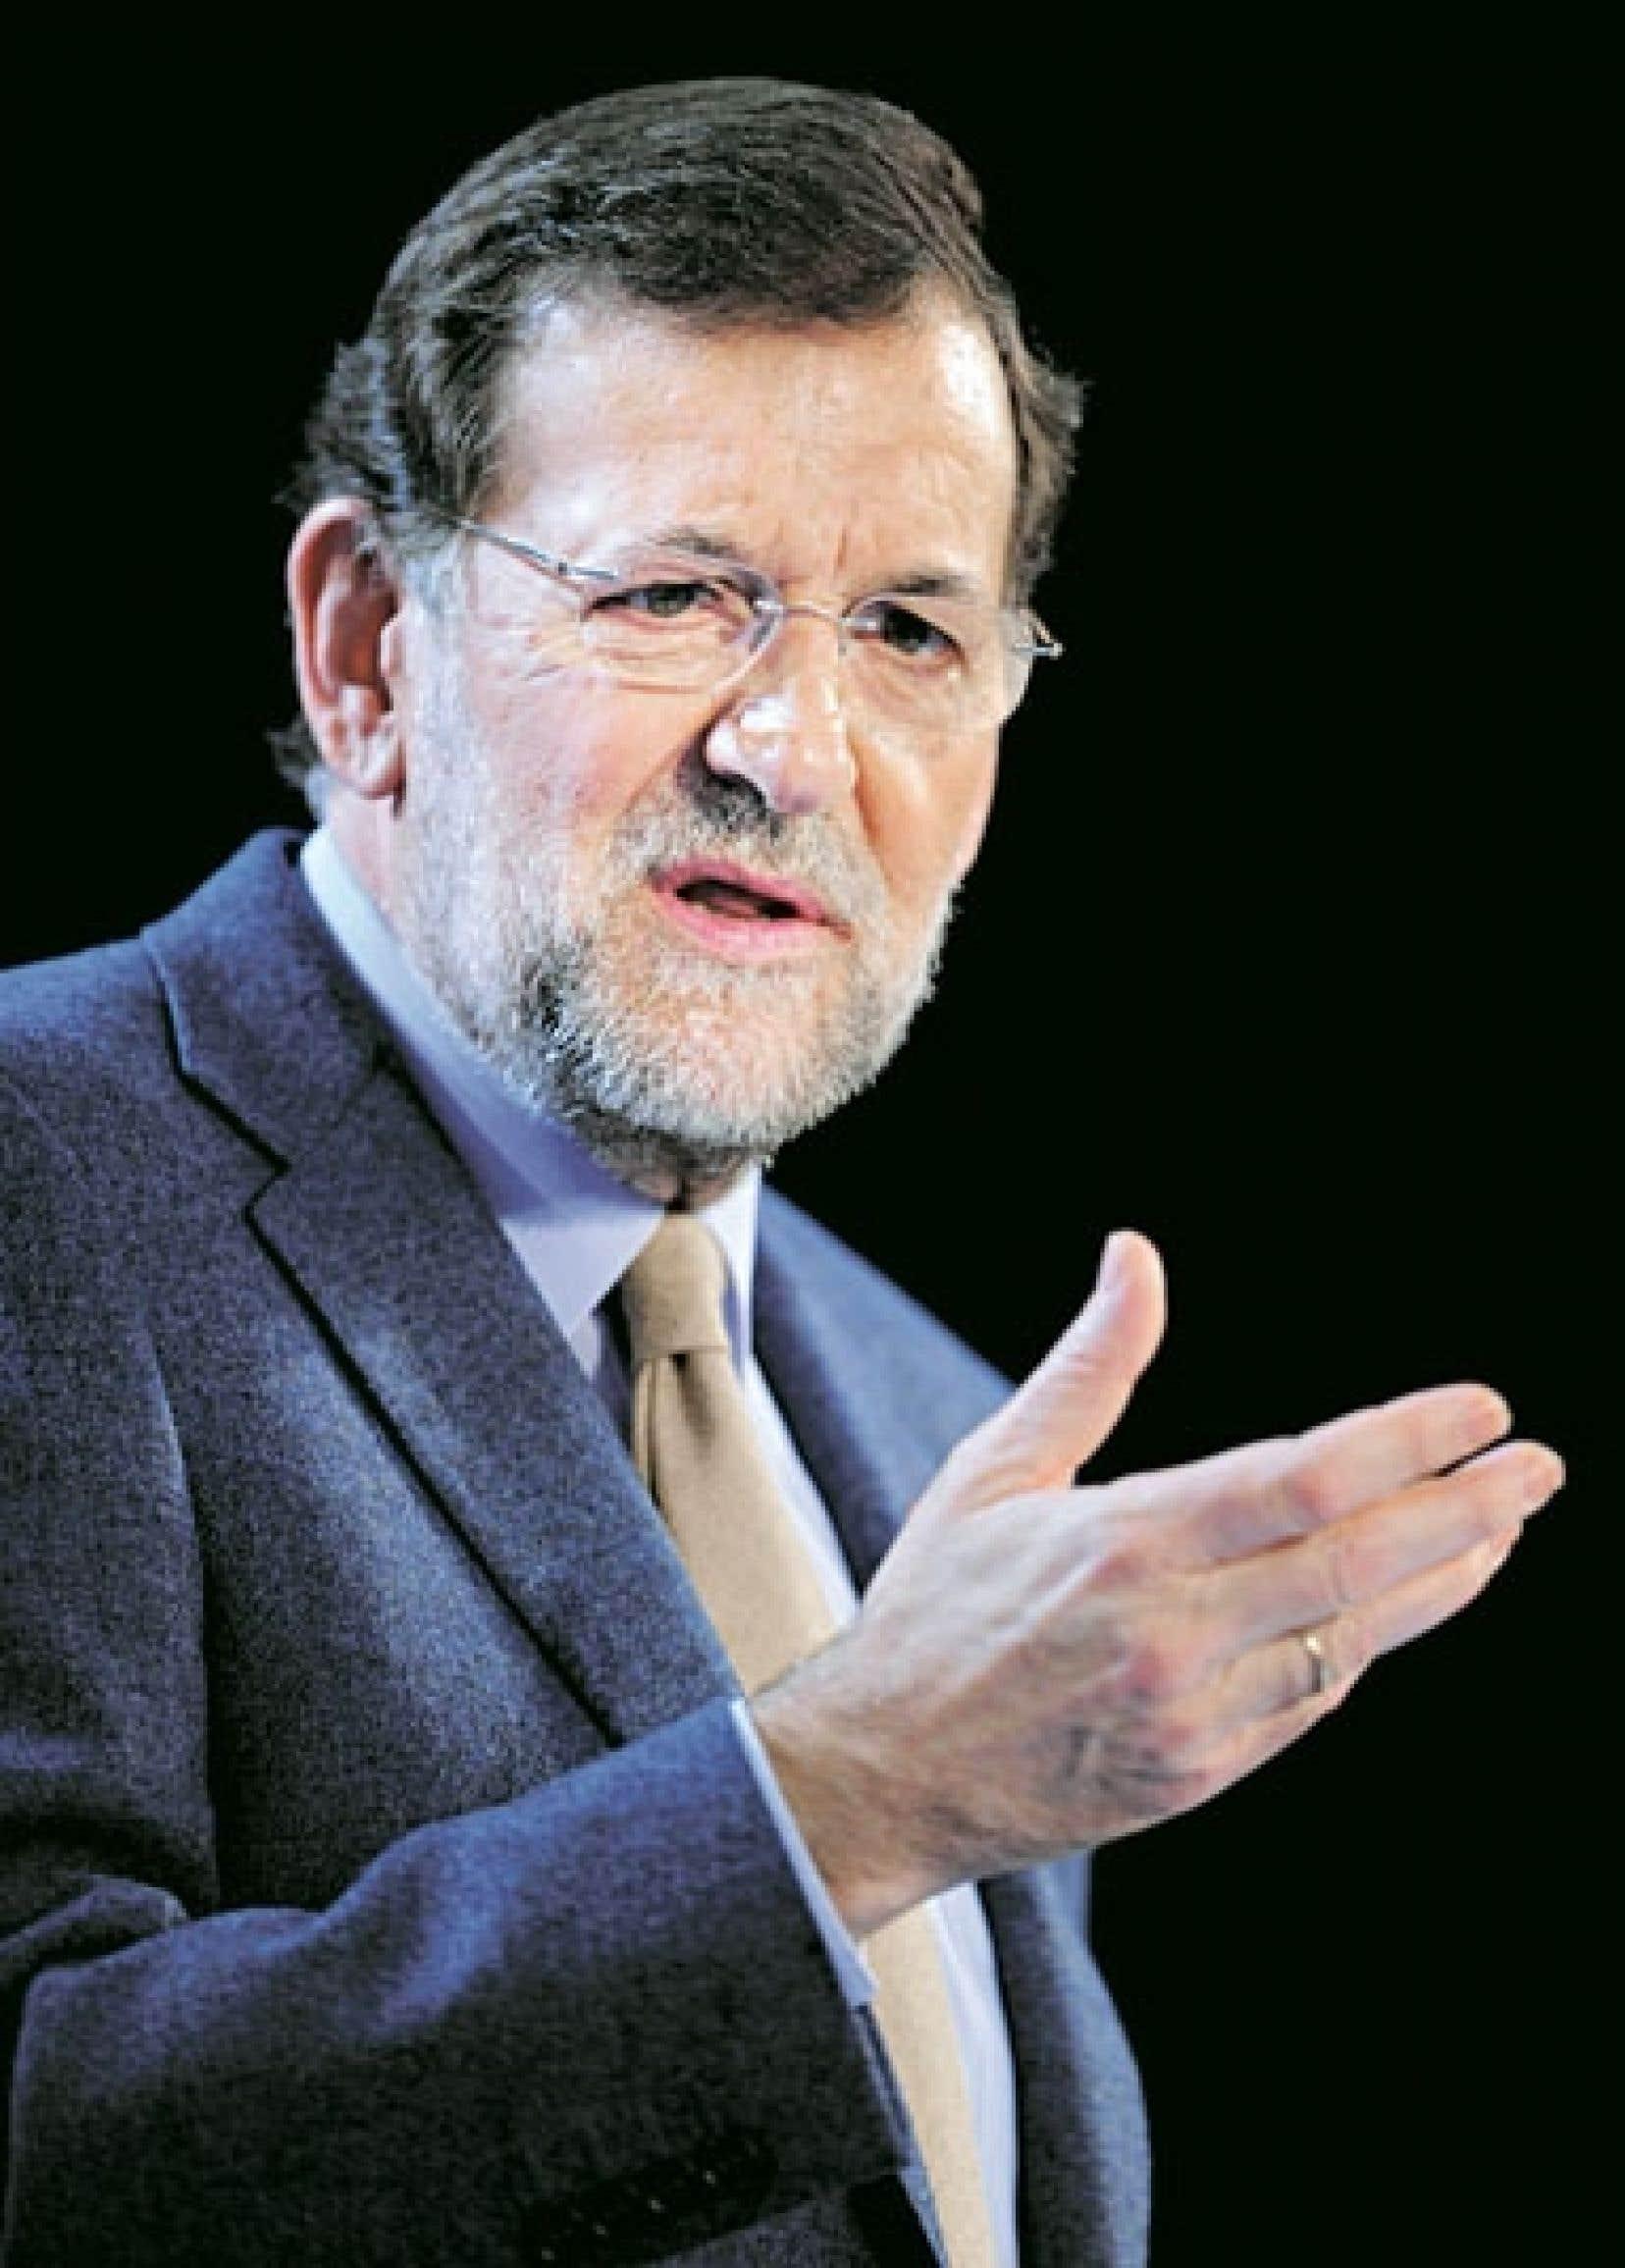 <div> Le chef du gouvernement espagnol, Mariano Rajoy</div>